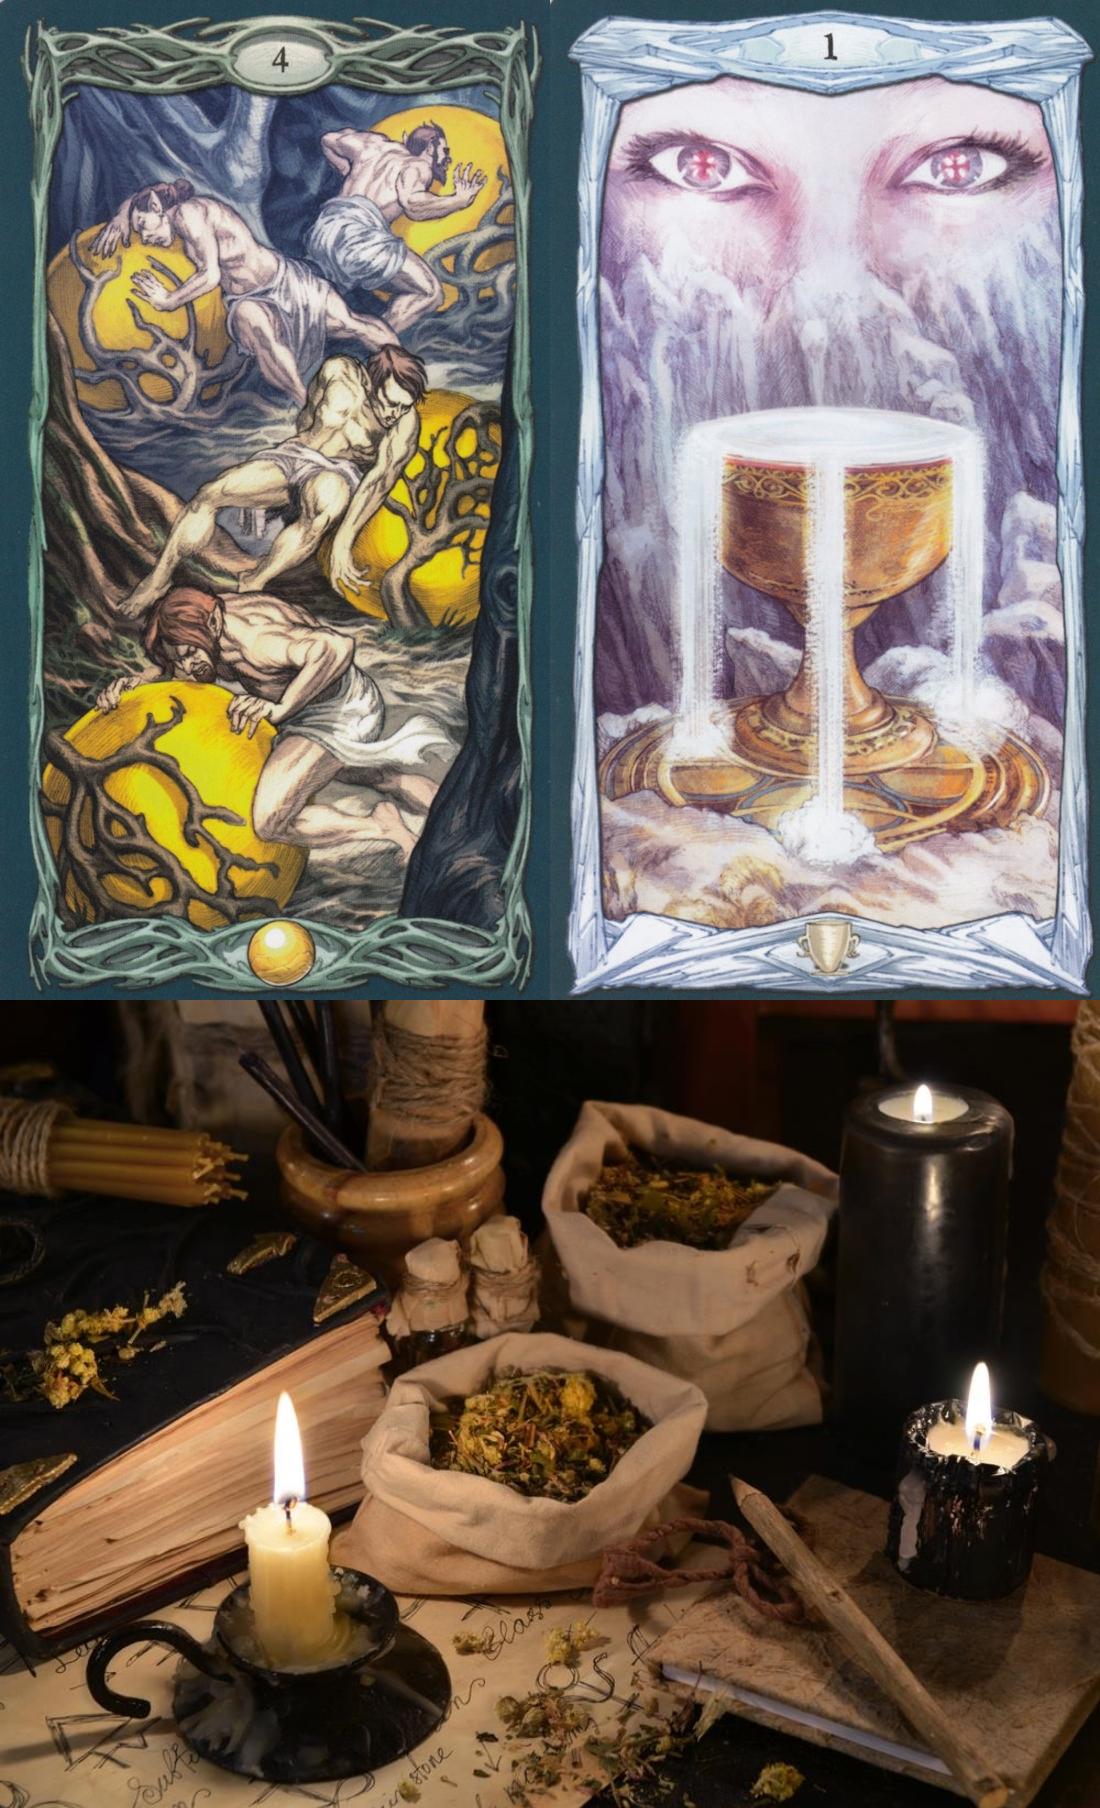 Daily Tarot Reading Free Tarot Card Reading Lotus And Online Tarot